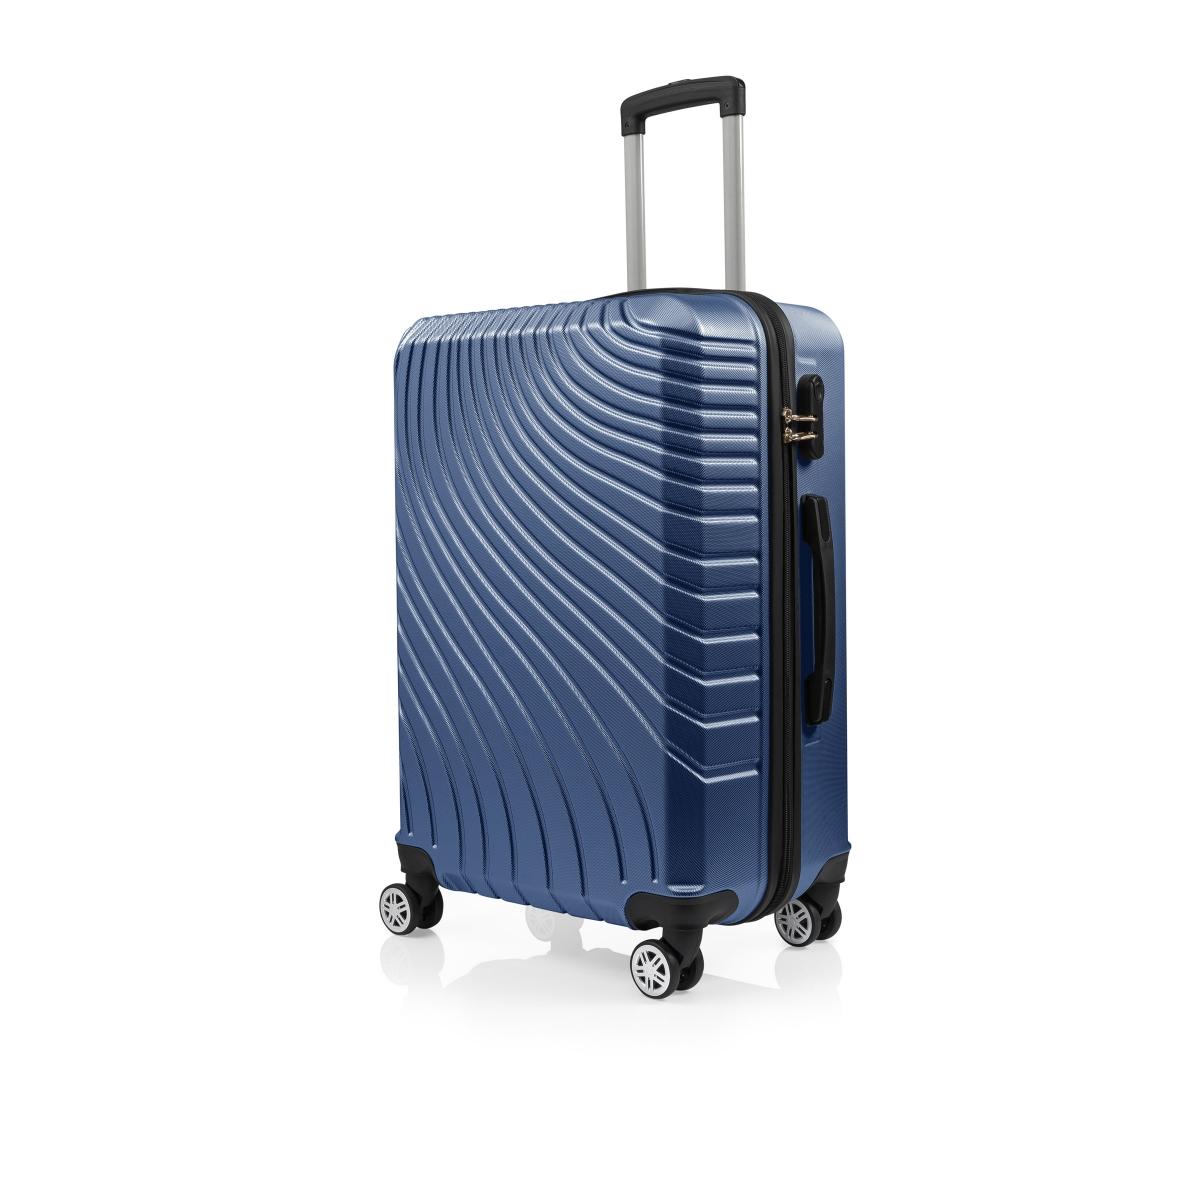 Gedox Abs 3'lü Valiz Seyahat Seti - Model:700.05 Çivit Mavi